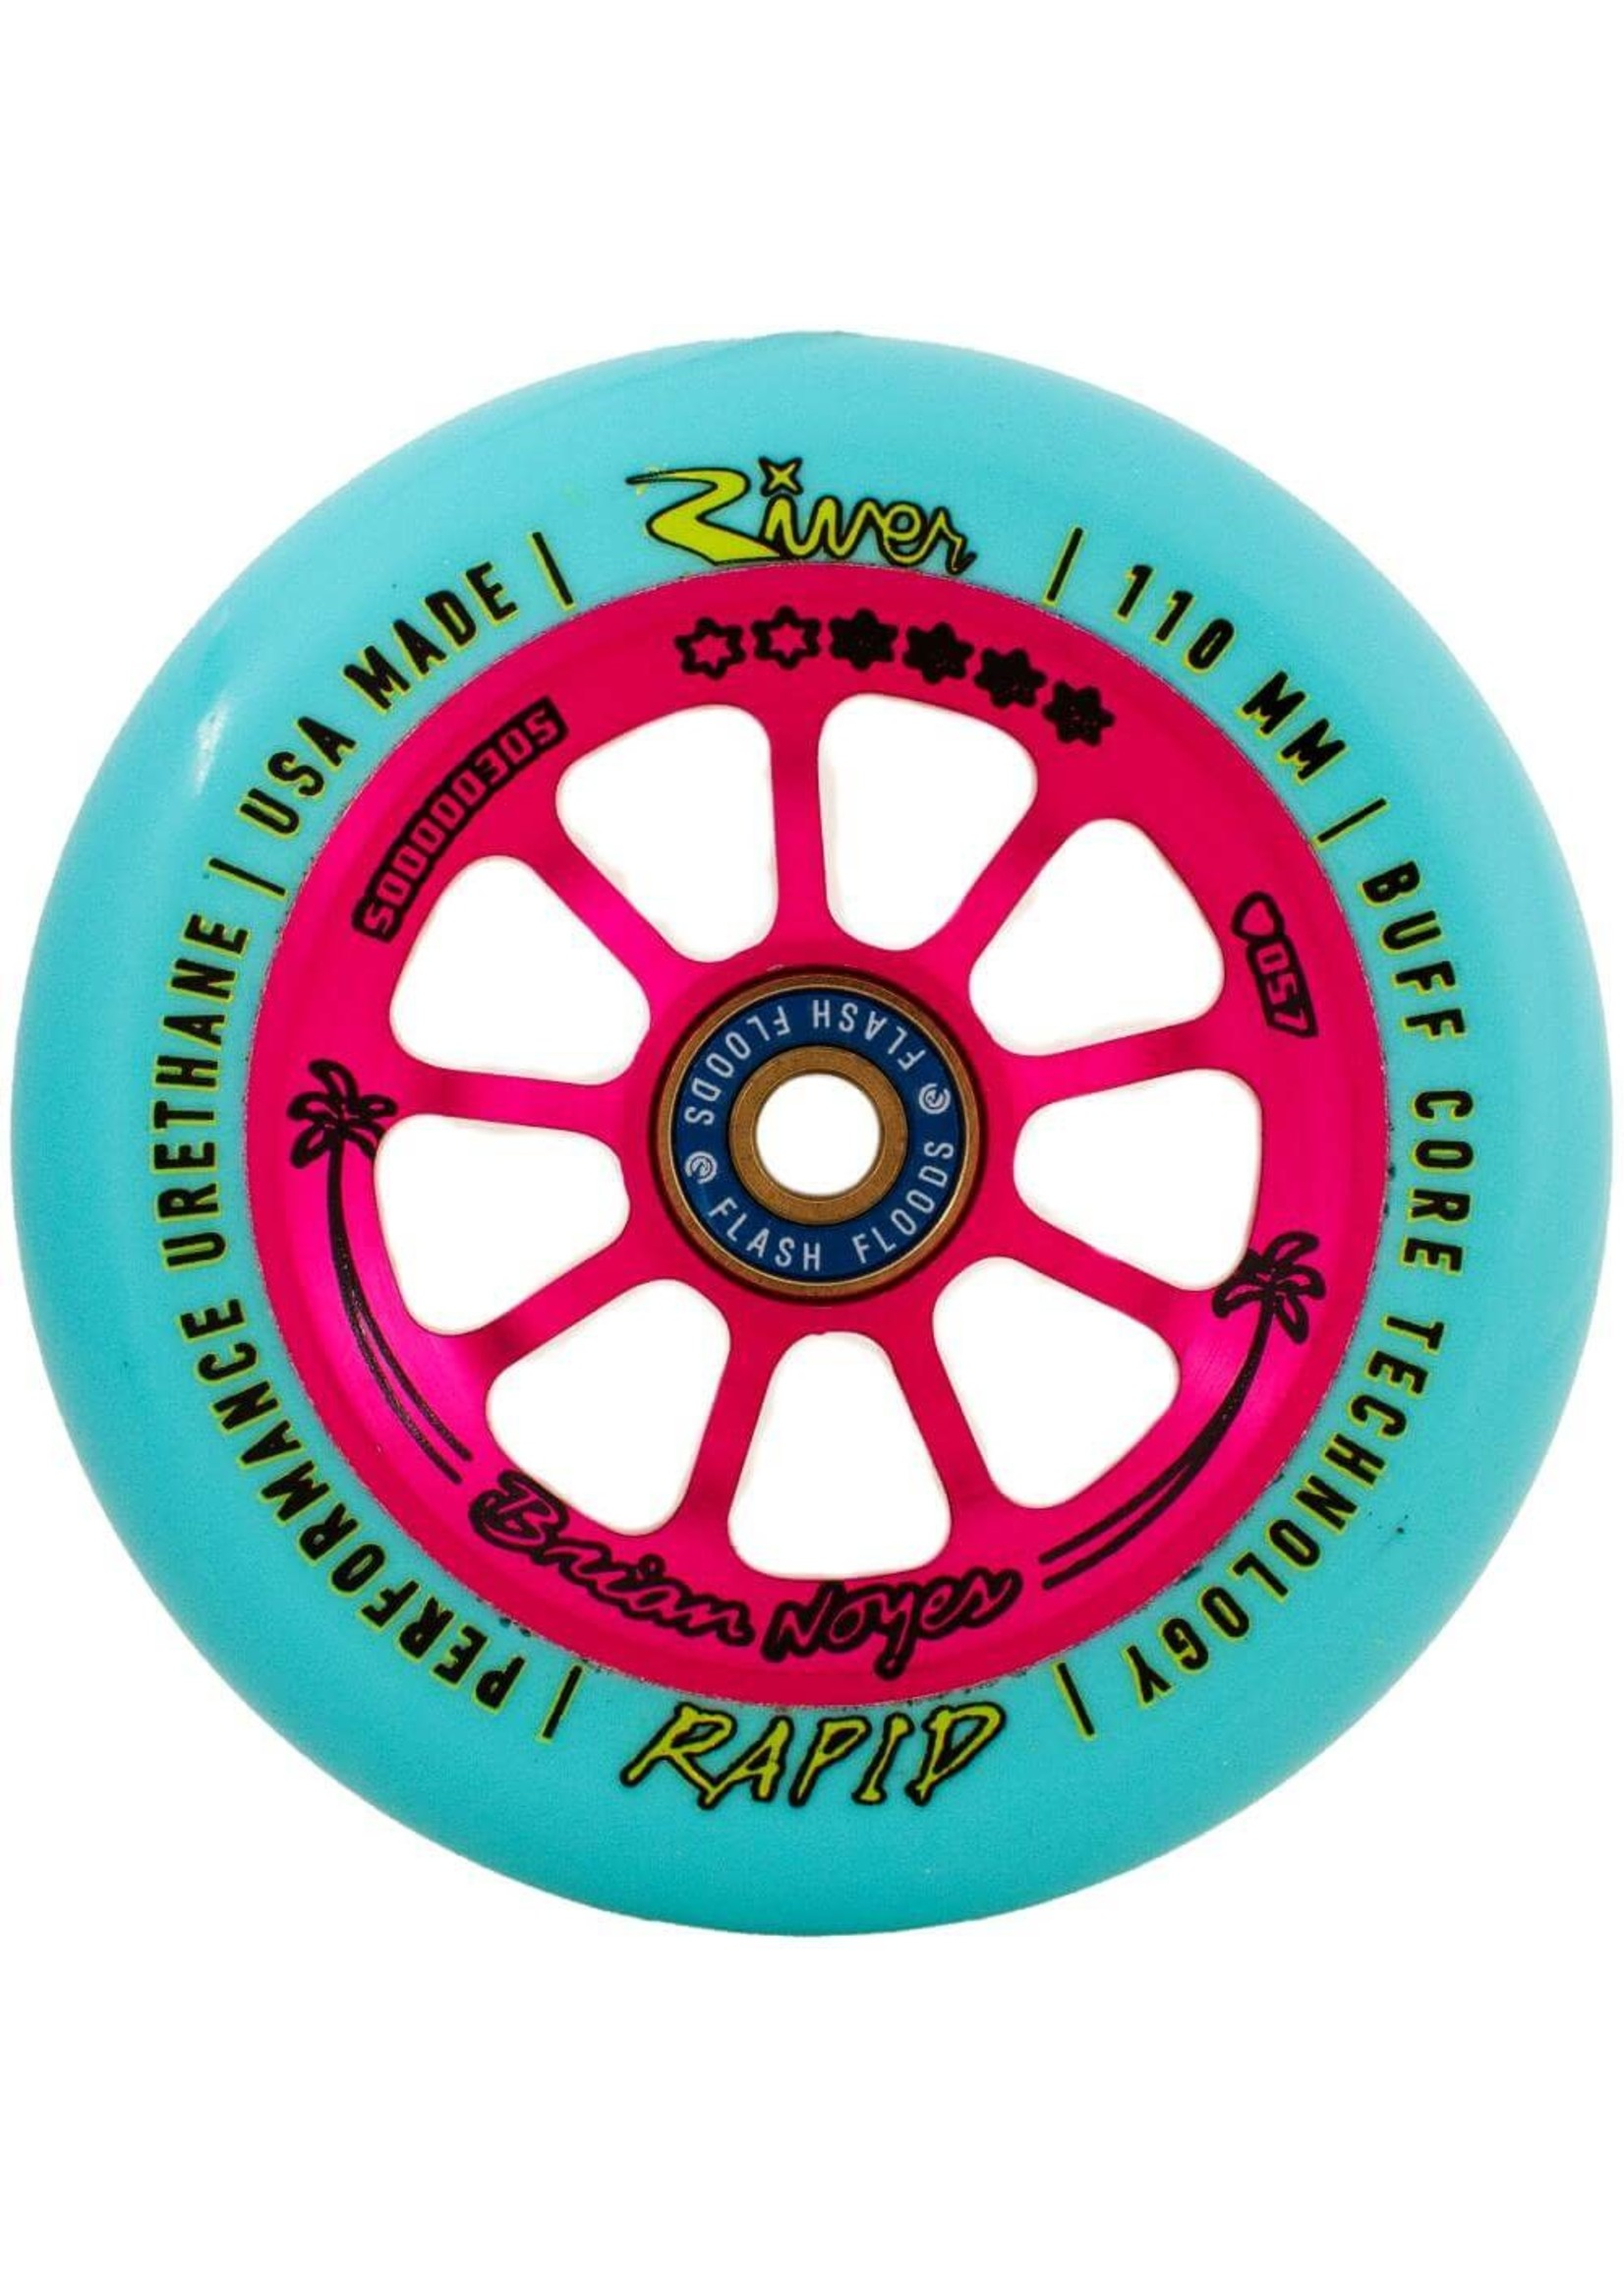 River Wheel Co. River - Rapids Brian Noyes Sig. - 110mm